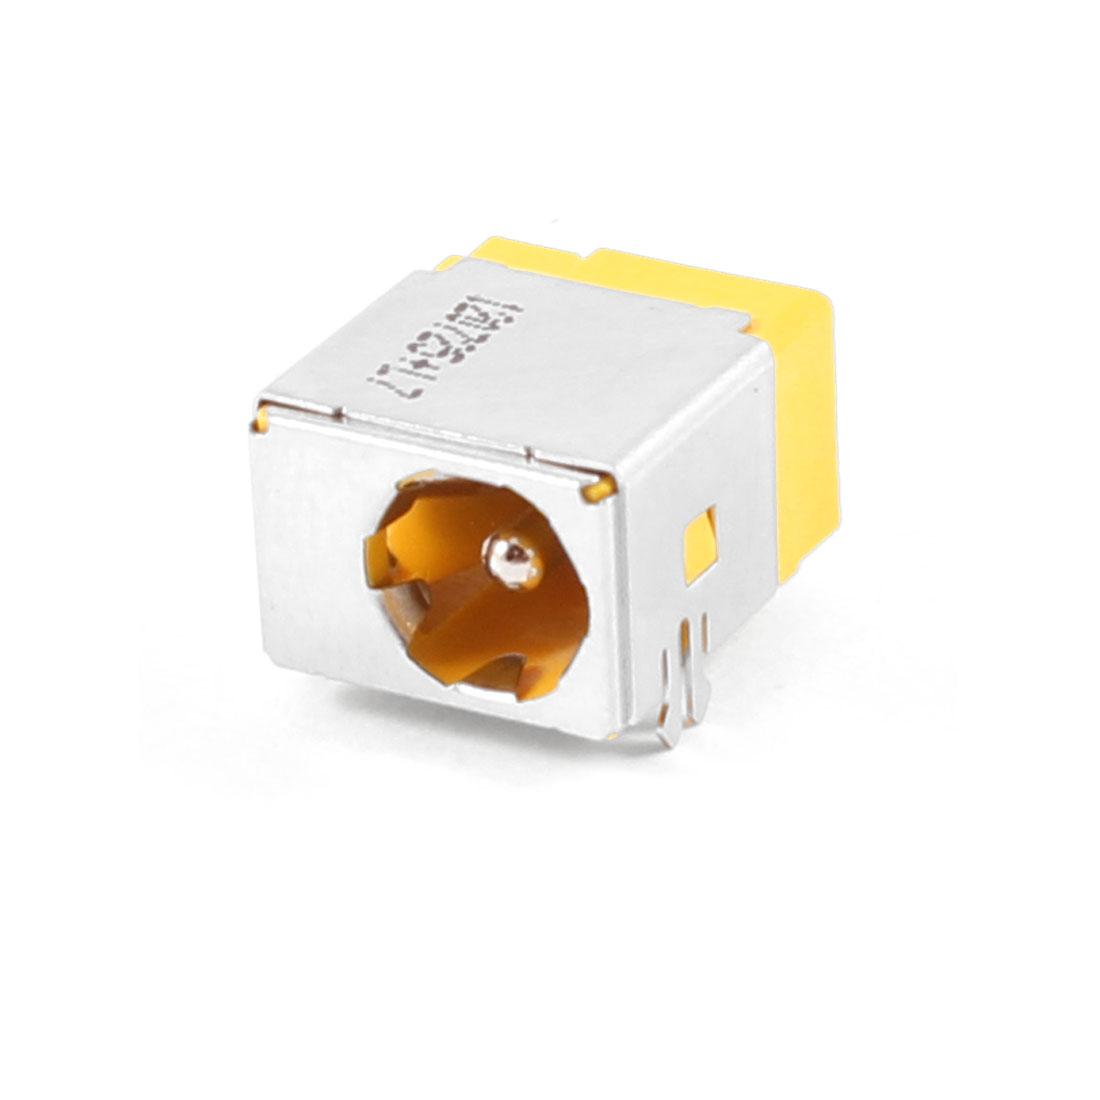 PJ056B DC Power Jack for Acer Aspire 3650 3660 3680 5040 5050 5570 5570Z